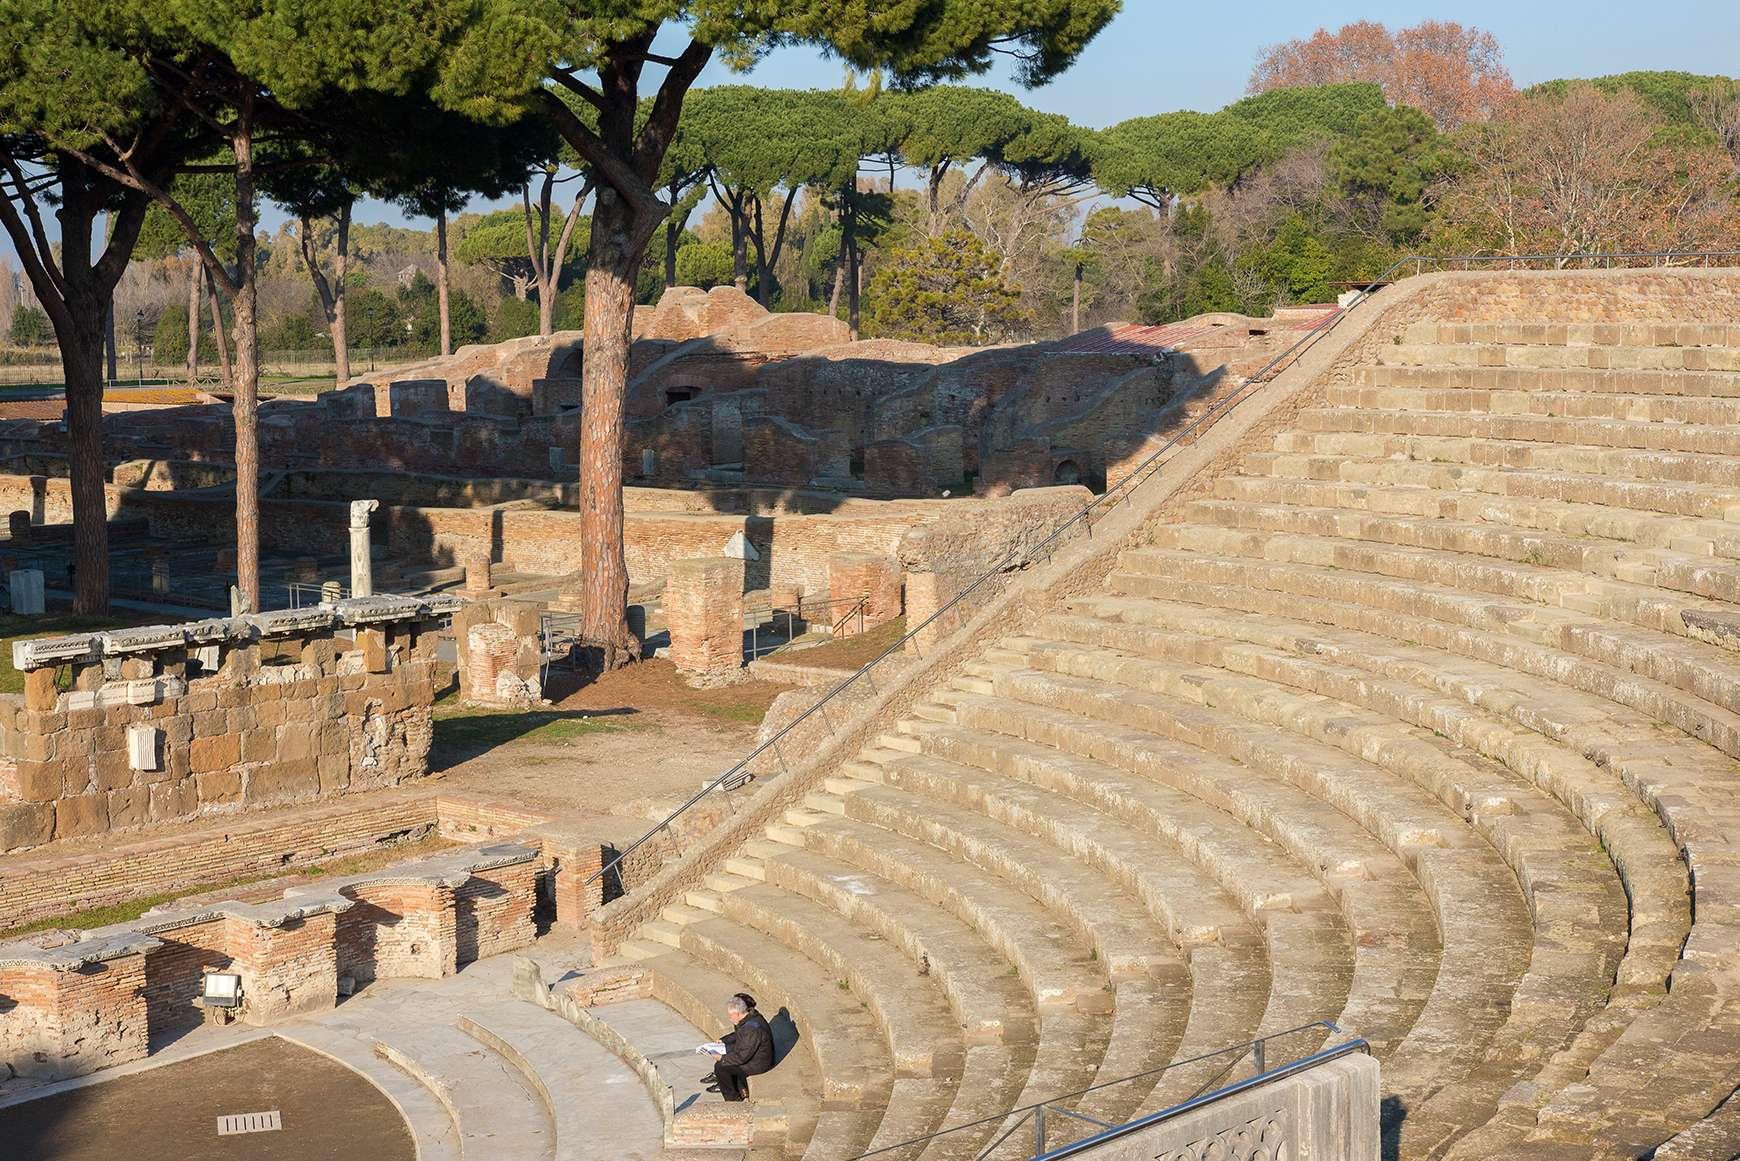 Rows of amphitheater seats at Agrippa's Theatre, Ostia near Rome